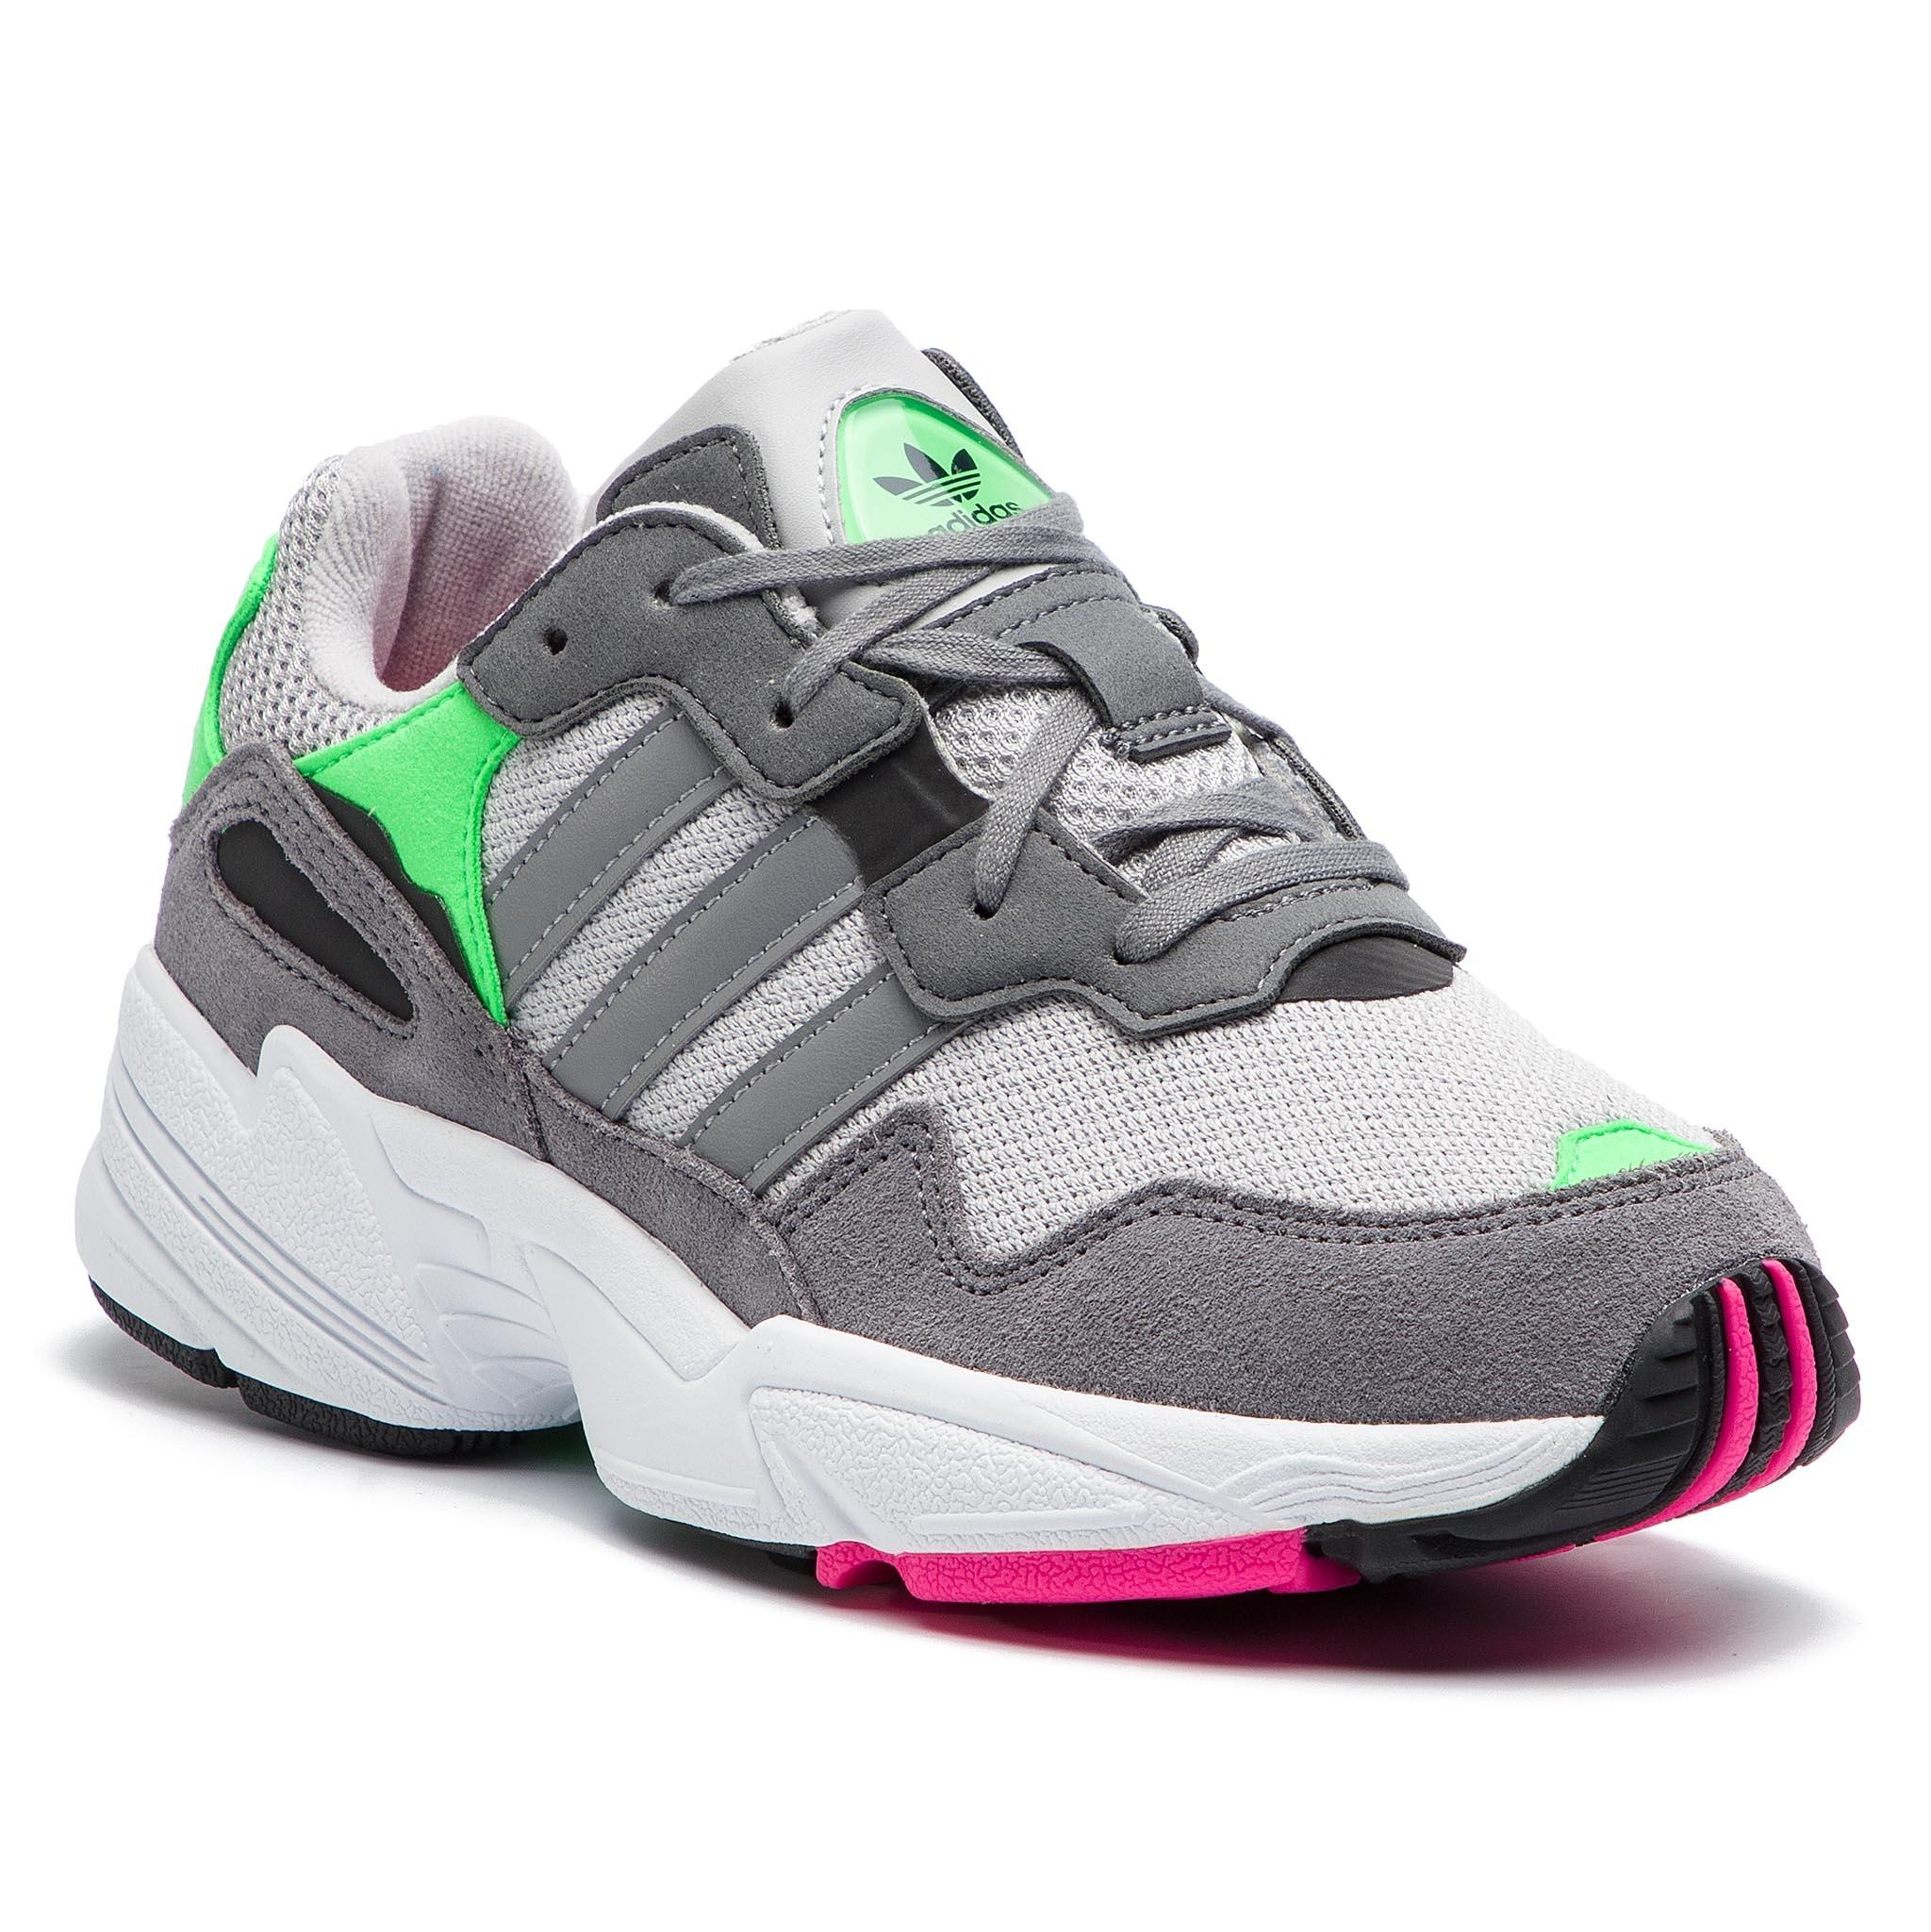 competitive price fe2dd d7b8e Cipő adidas - Yung-96 J DB2802 GretwoGrethrShopnk - Glami.hu